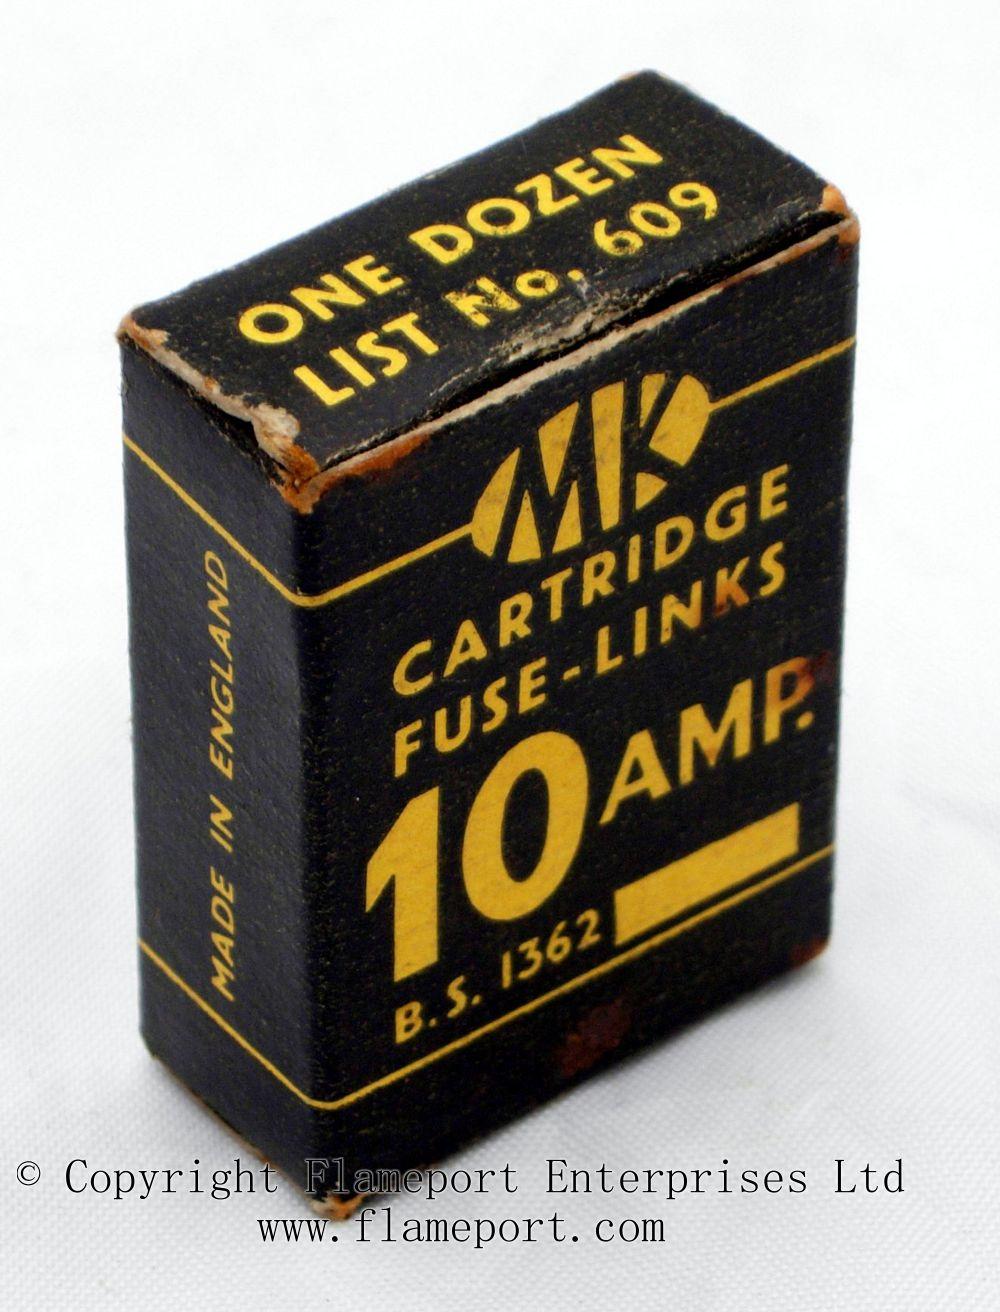 hight resolution of mk cartridge fuse links list no 609 box of one dozen 10 amp fuses